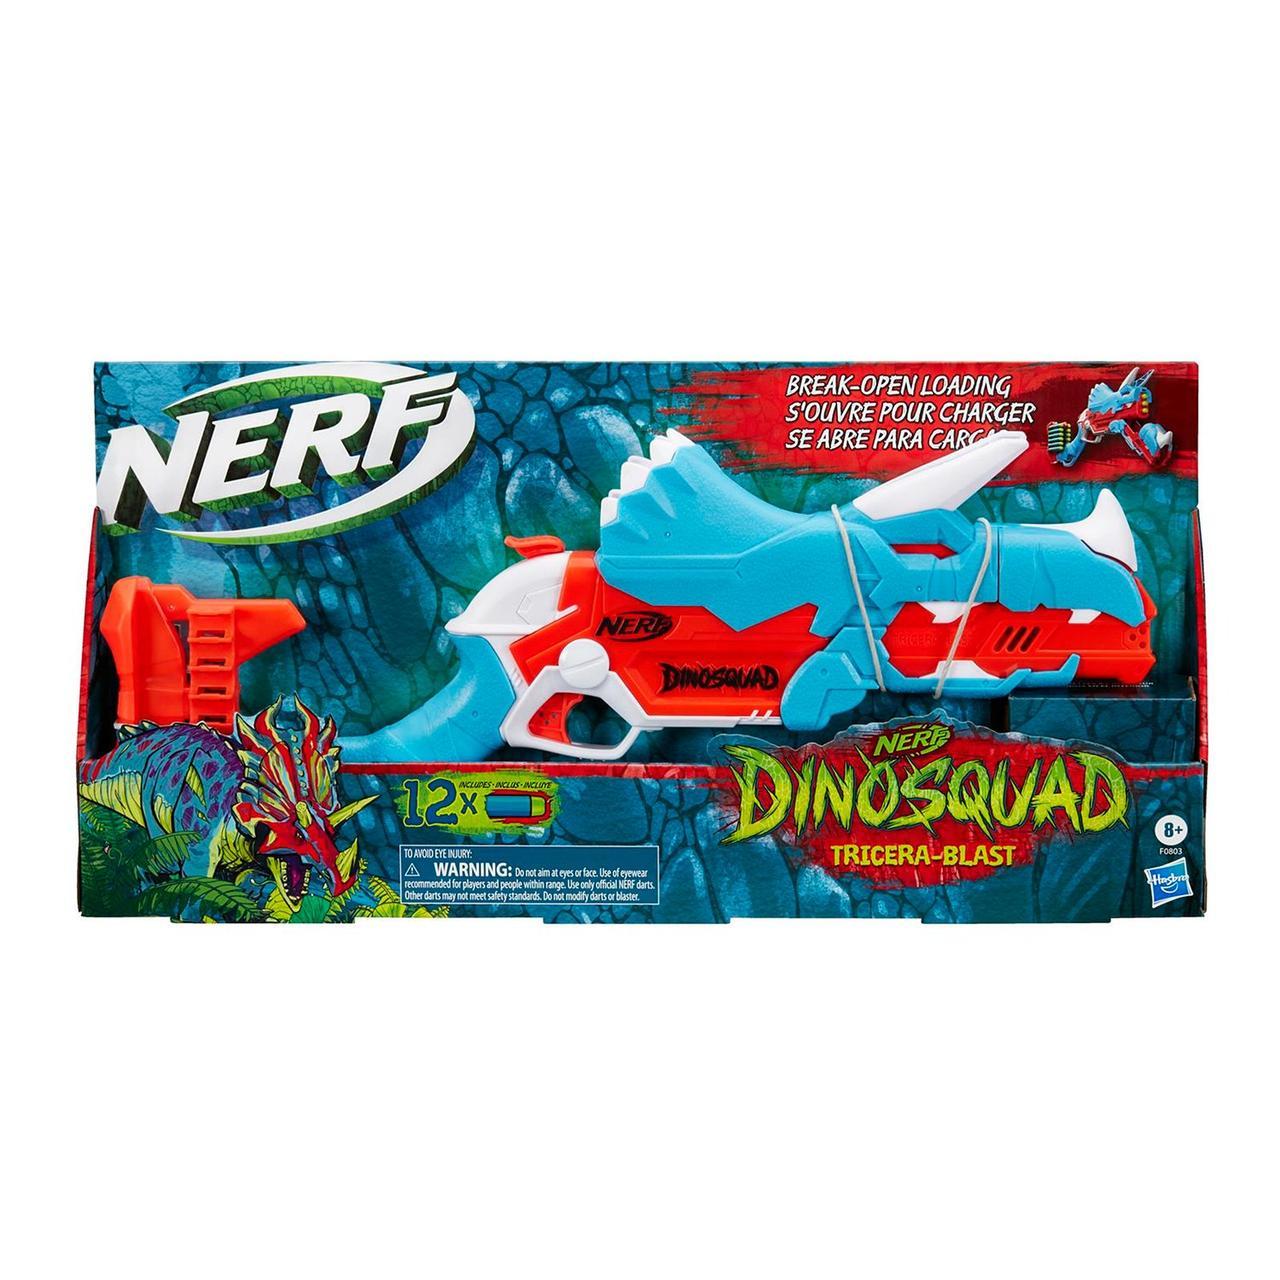 Hasbro Nerf Dinosquad Бластер Дино Трицерабласт, Нёрф